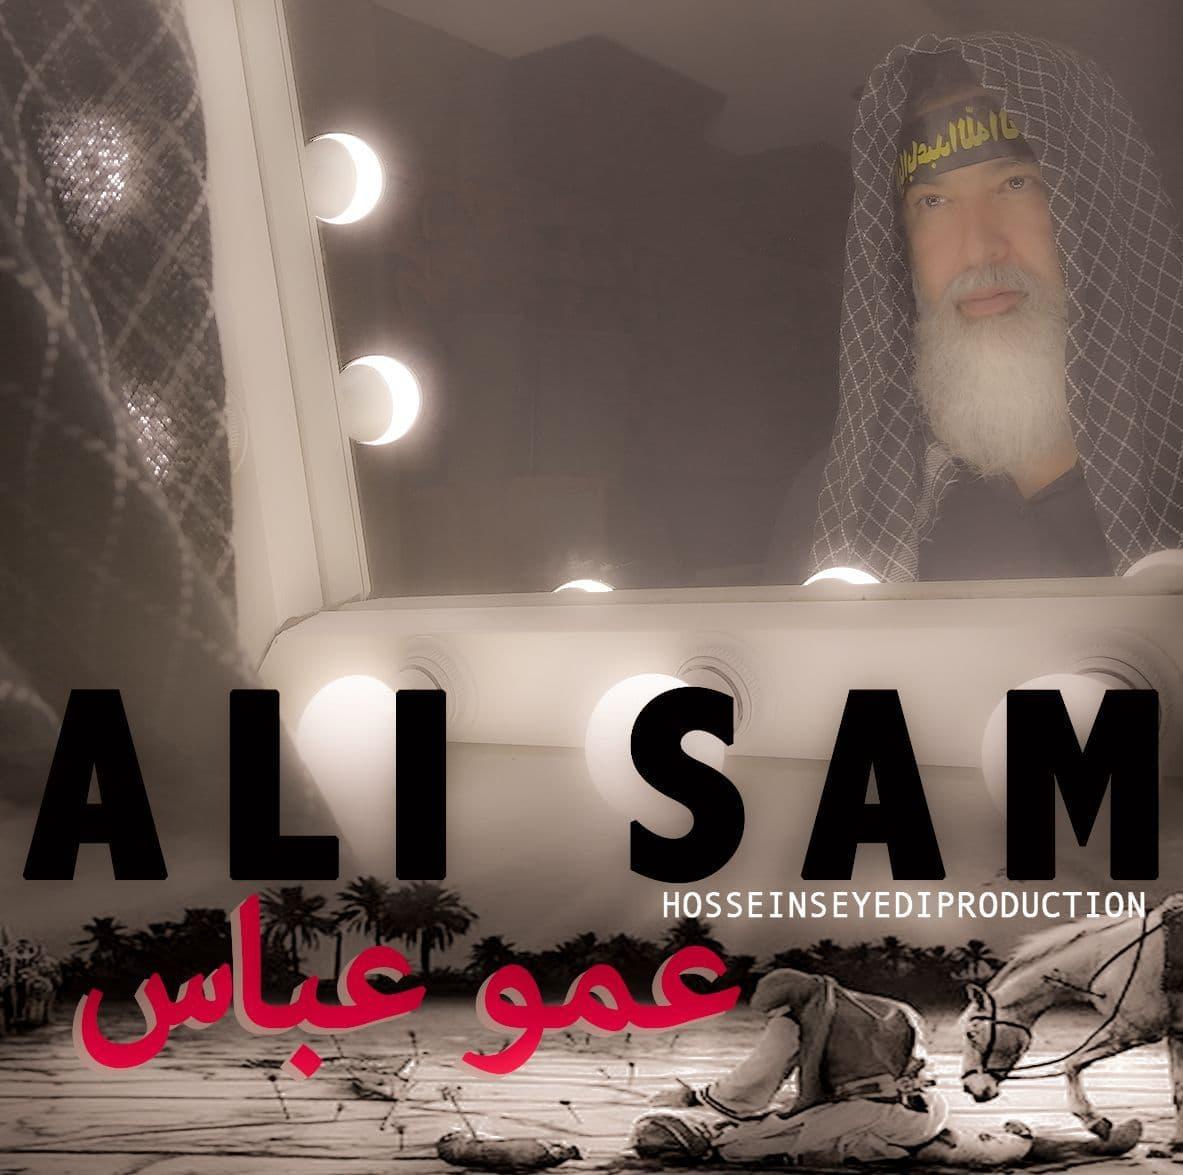 آهنگ علی سام عمو عباس